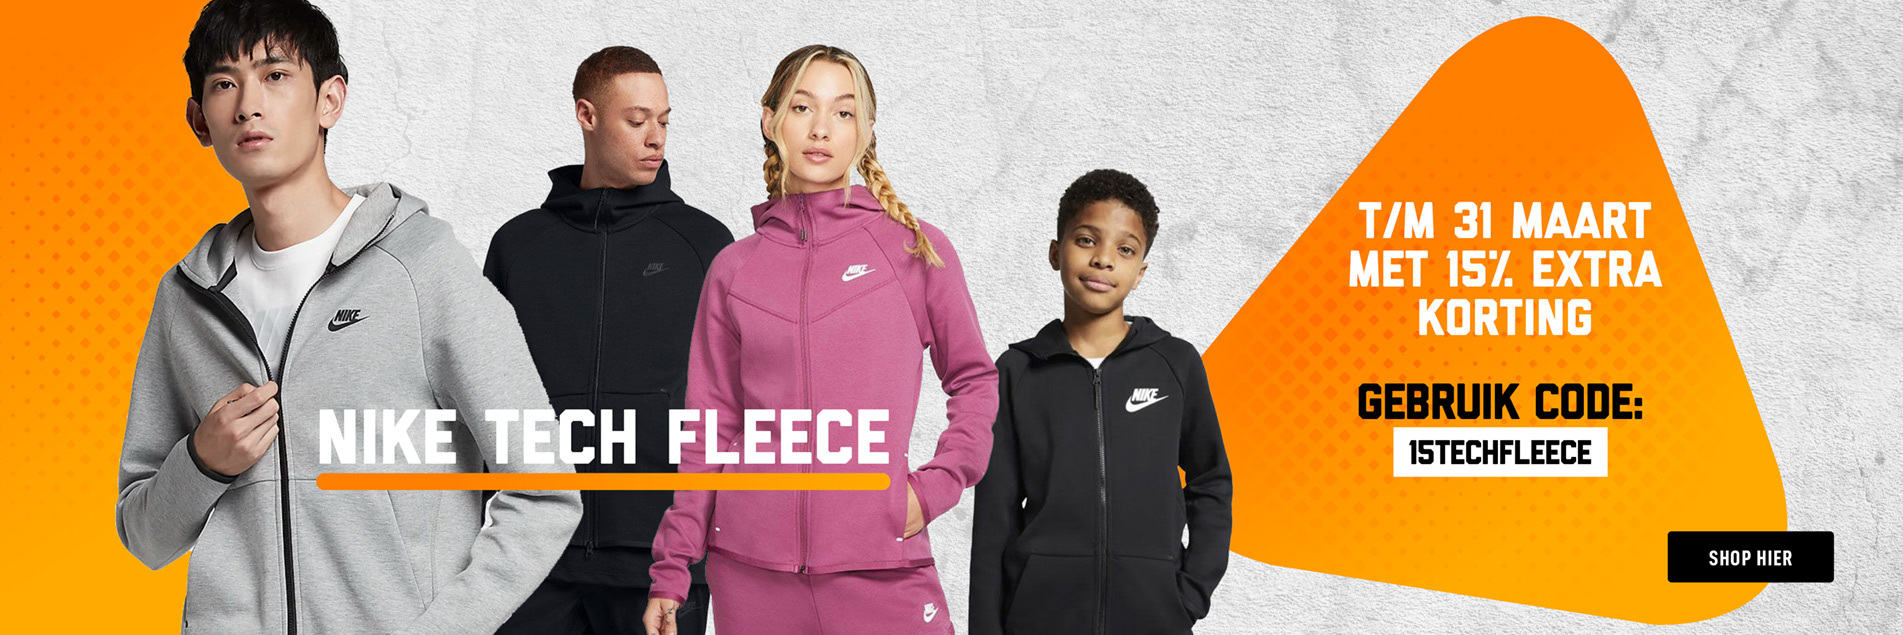 Nike Tech Fleece Actie